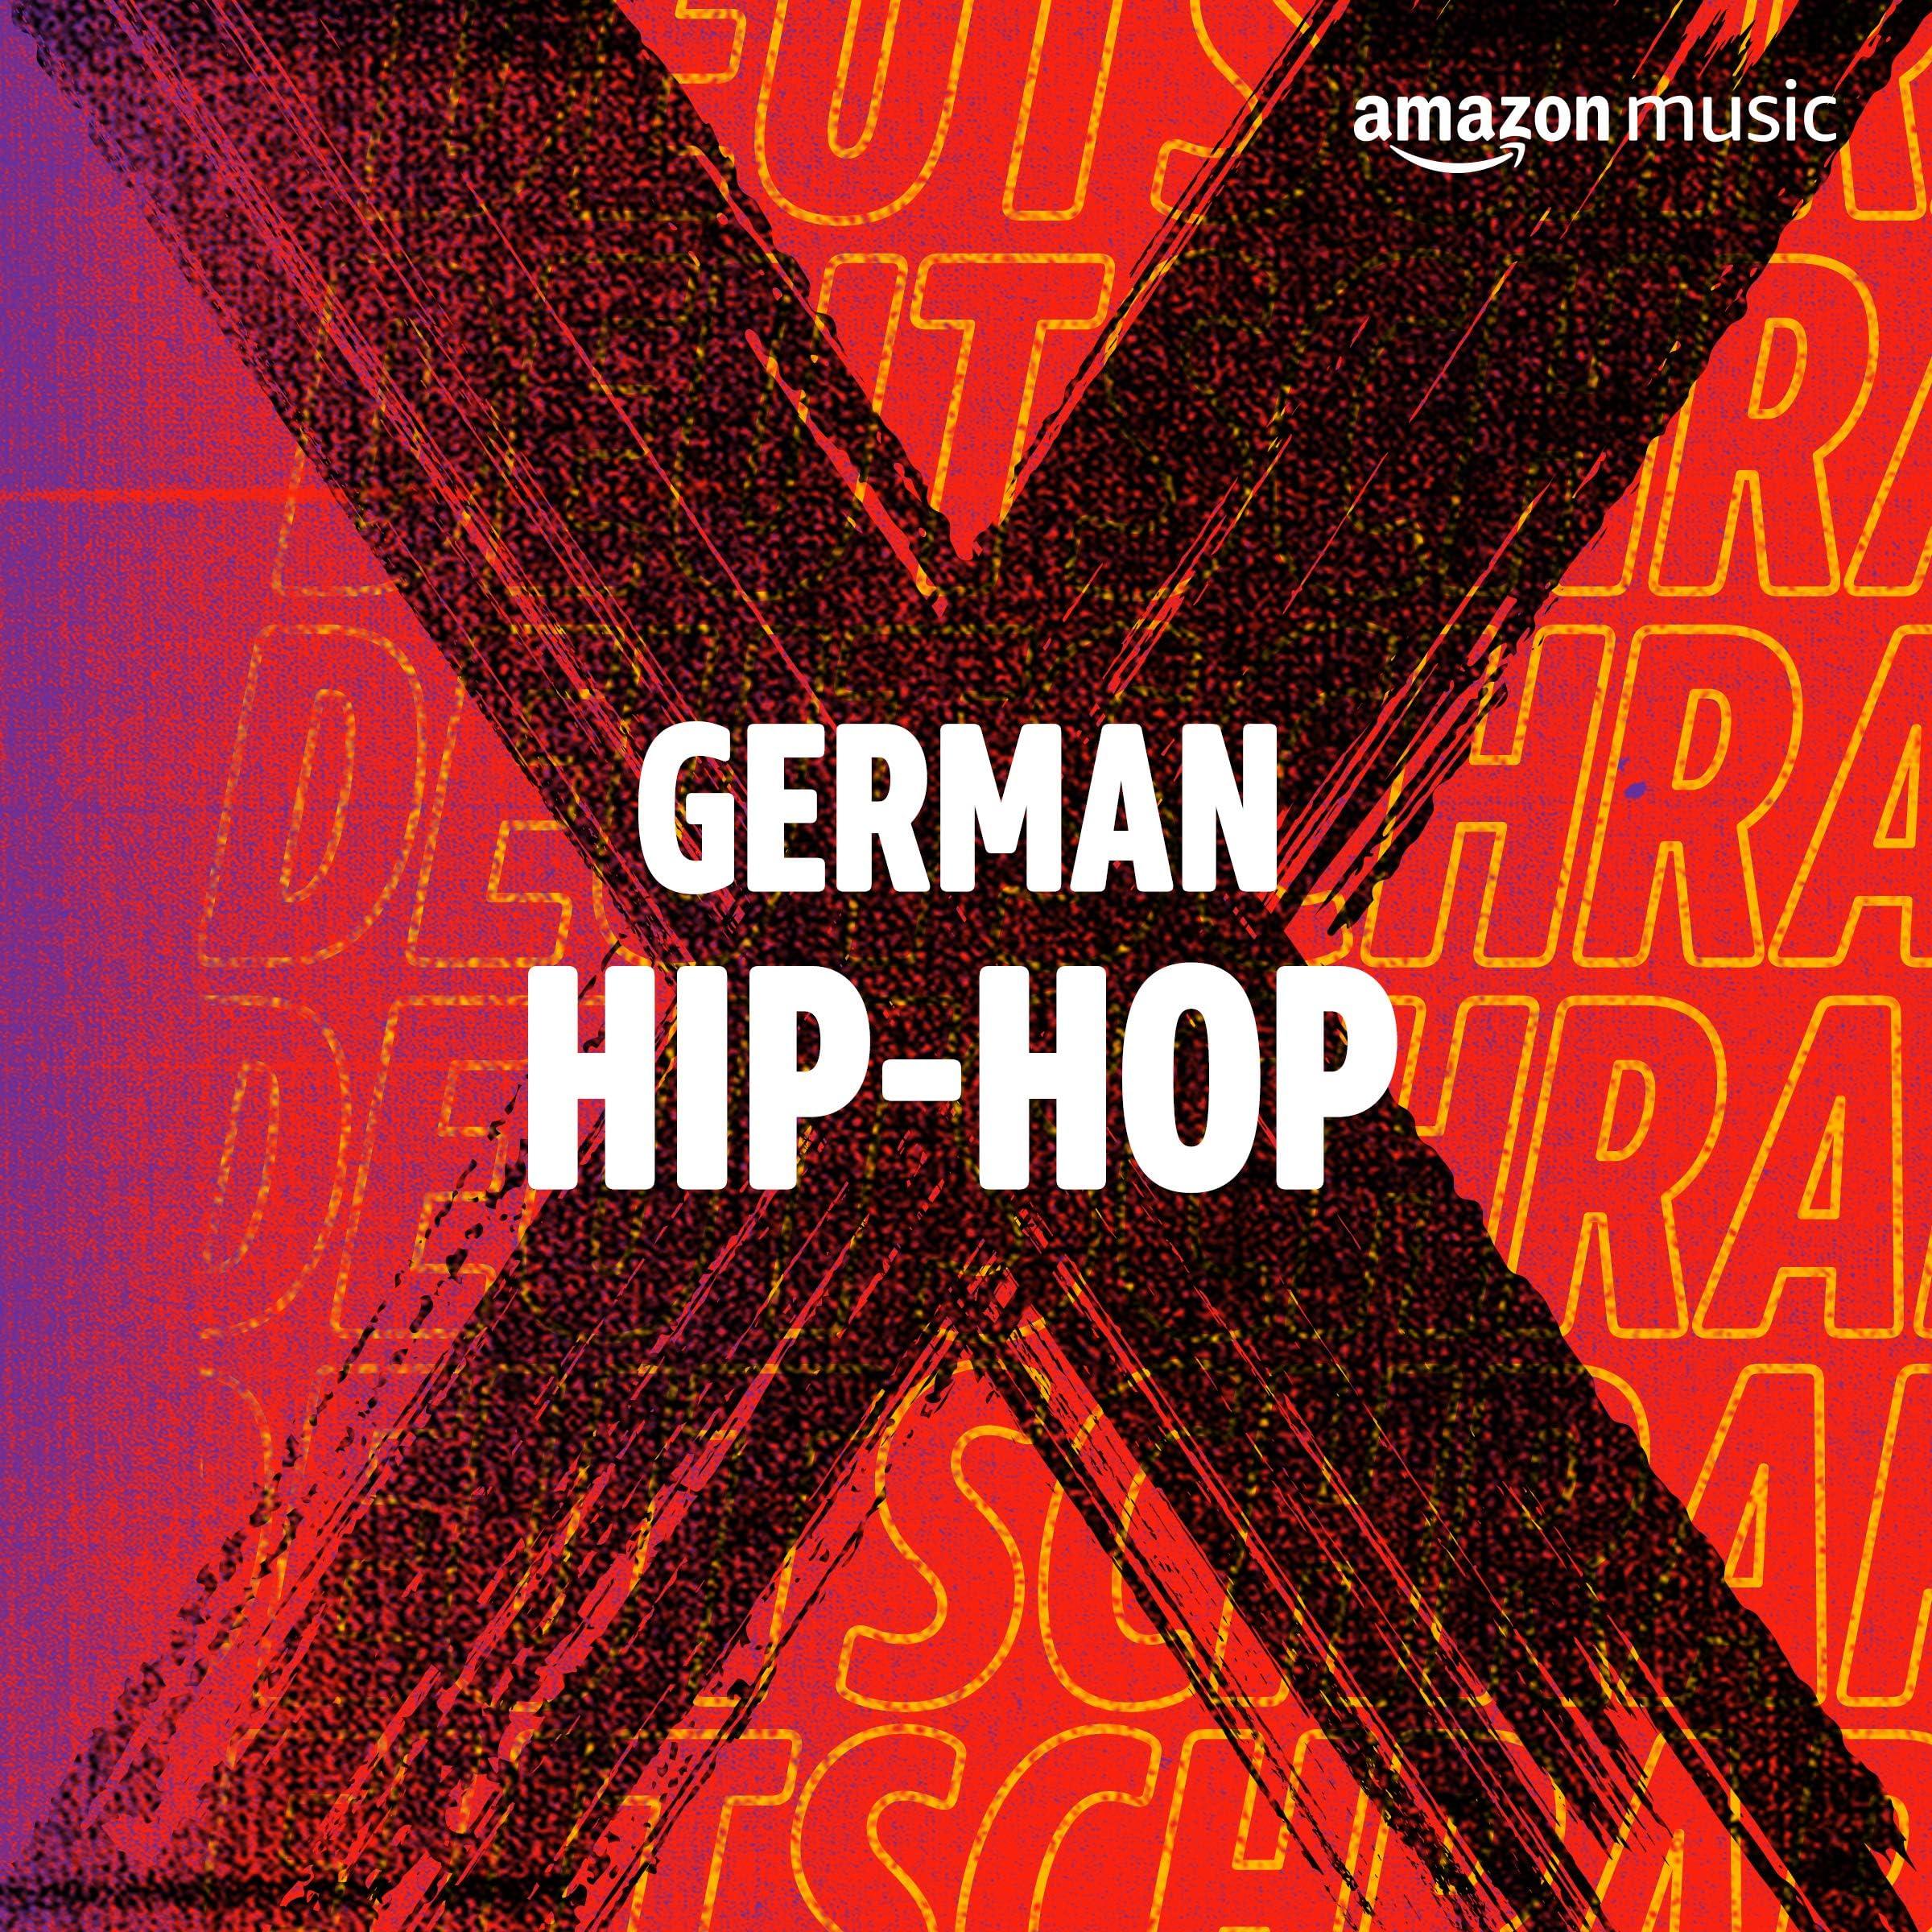 German Hip-Hop